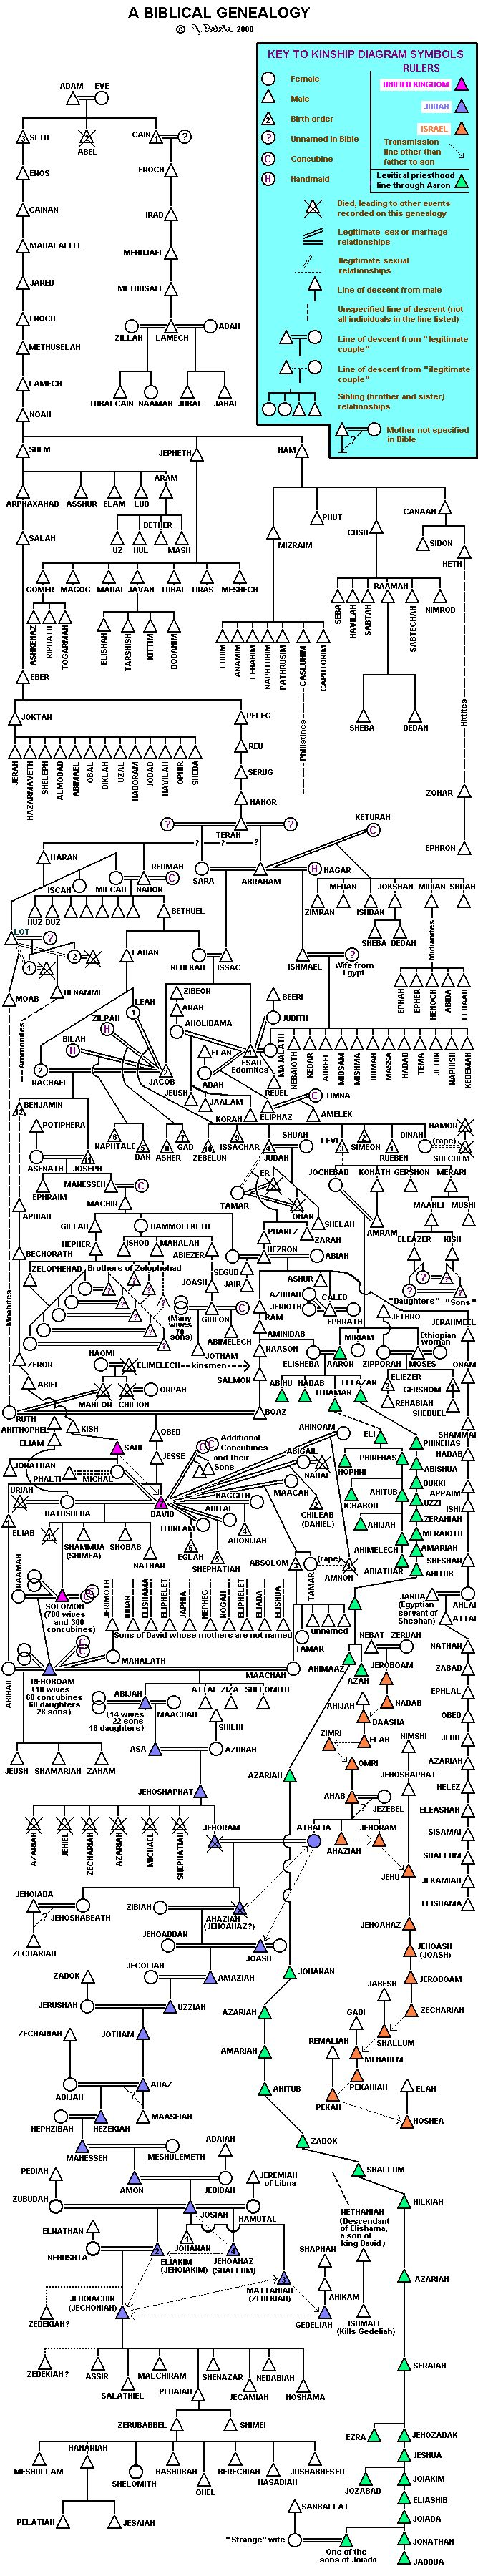 Venn Diagram Adam And Eve Automotive Wiring Logic Worksheet D45c19922b41e86207ea80cd913e132a 3 Way Template Diagrams